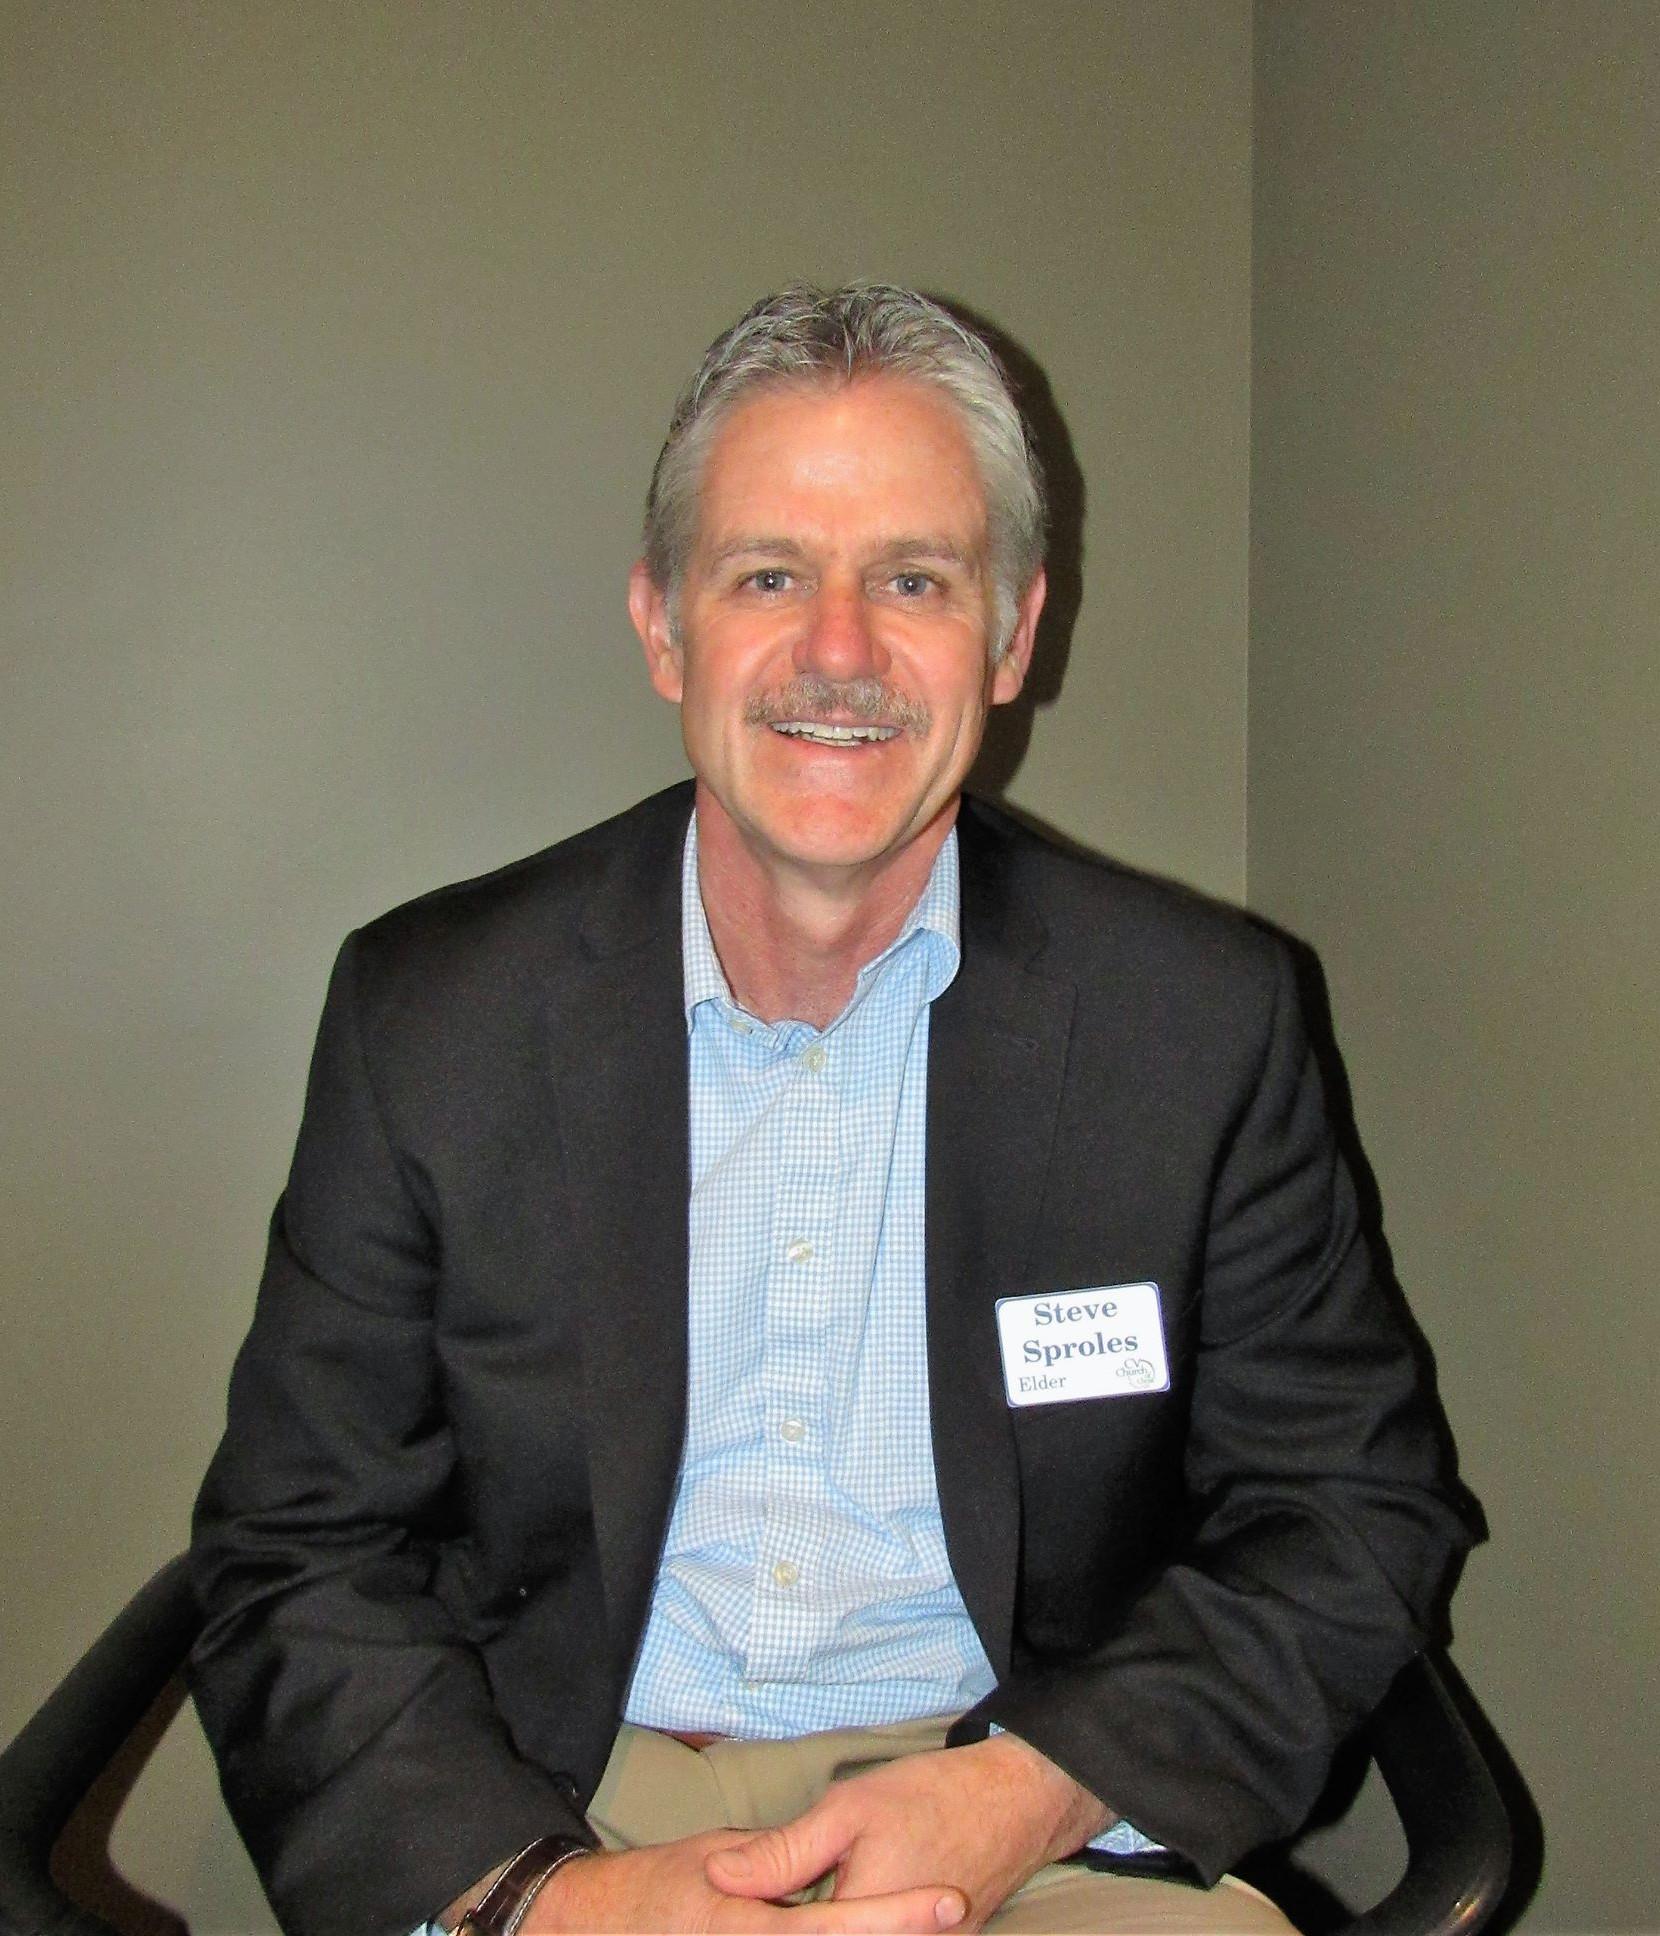 Steve Sproles